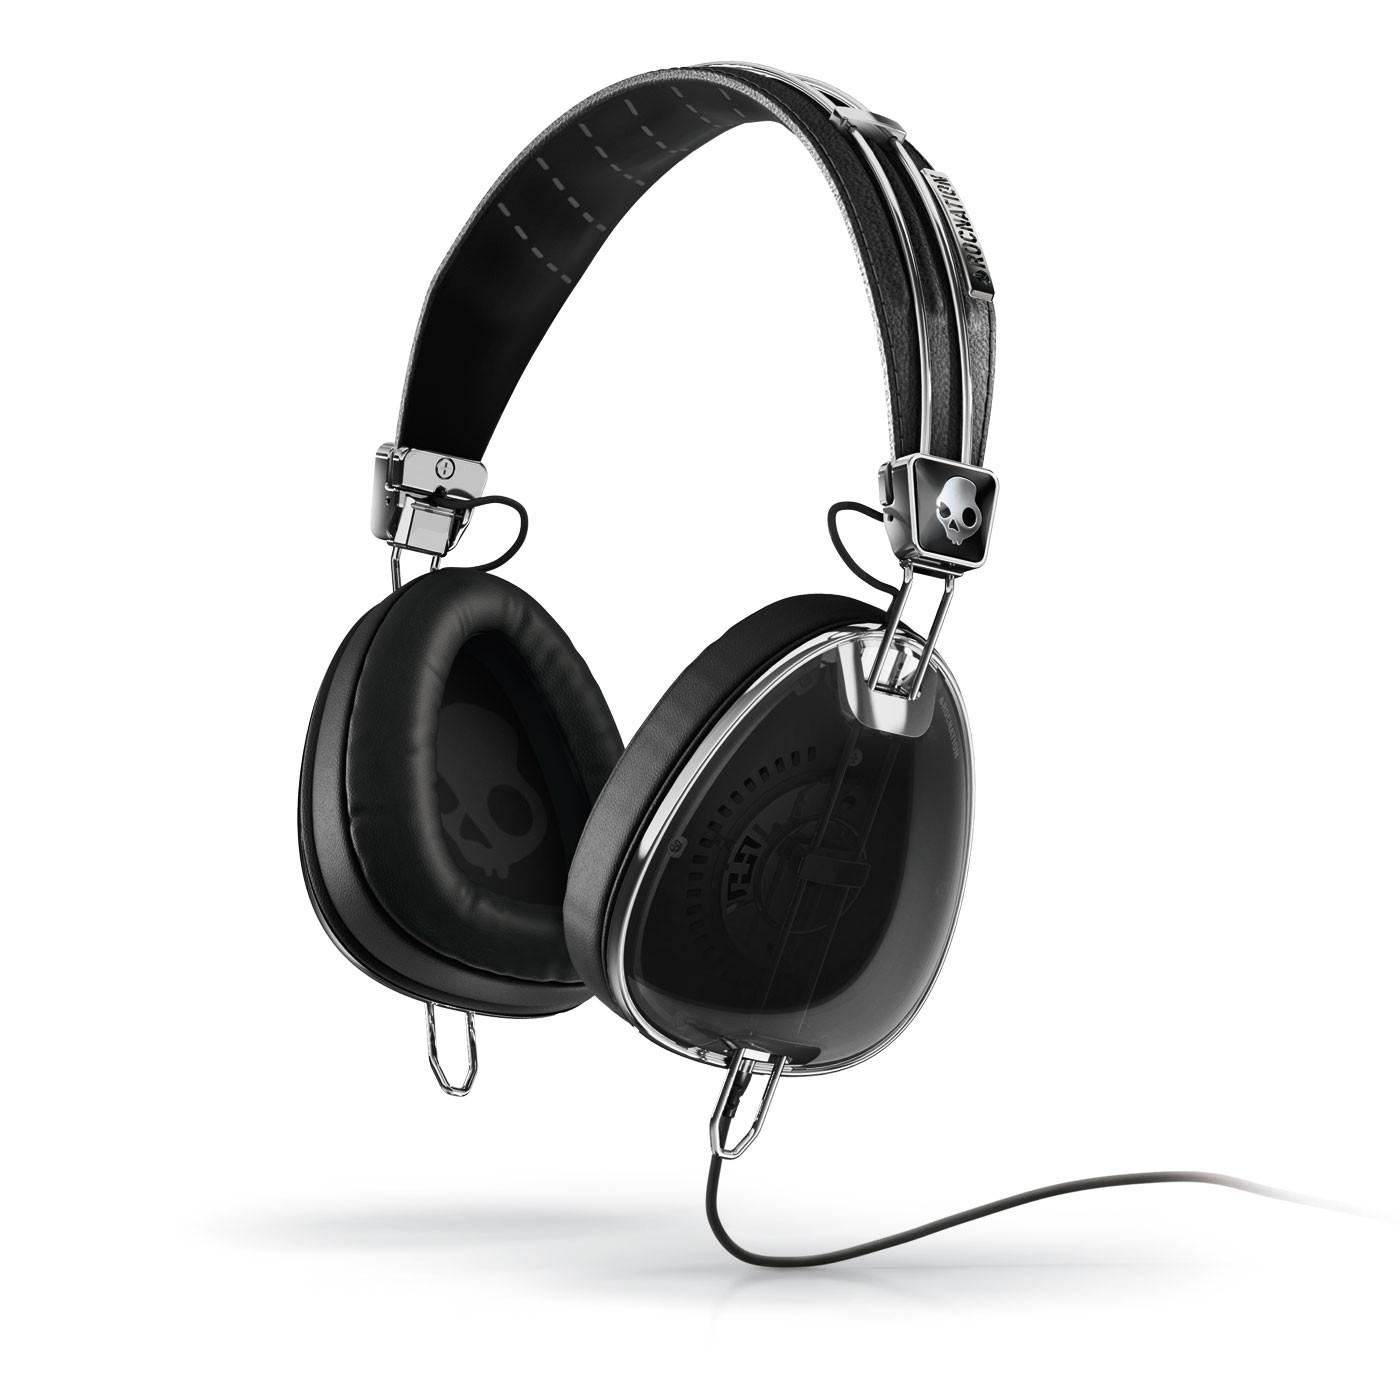 SkullcandyAviator Black Headphones